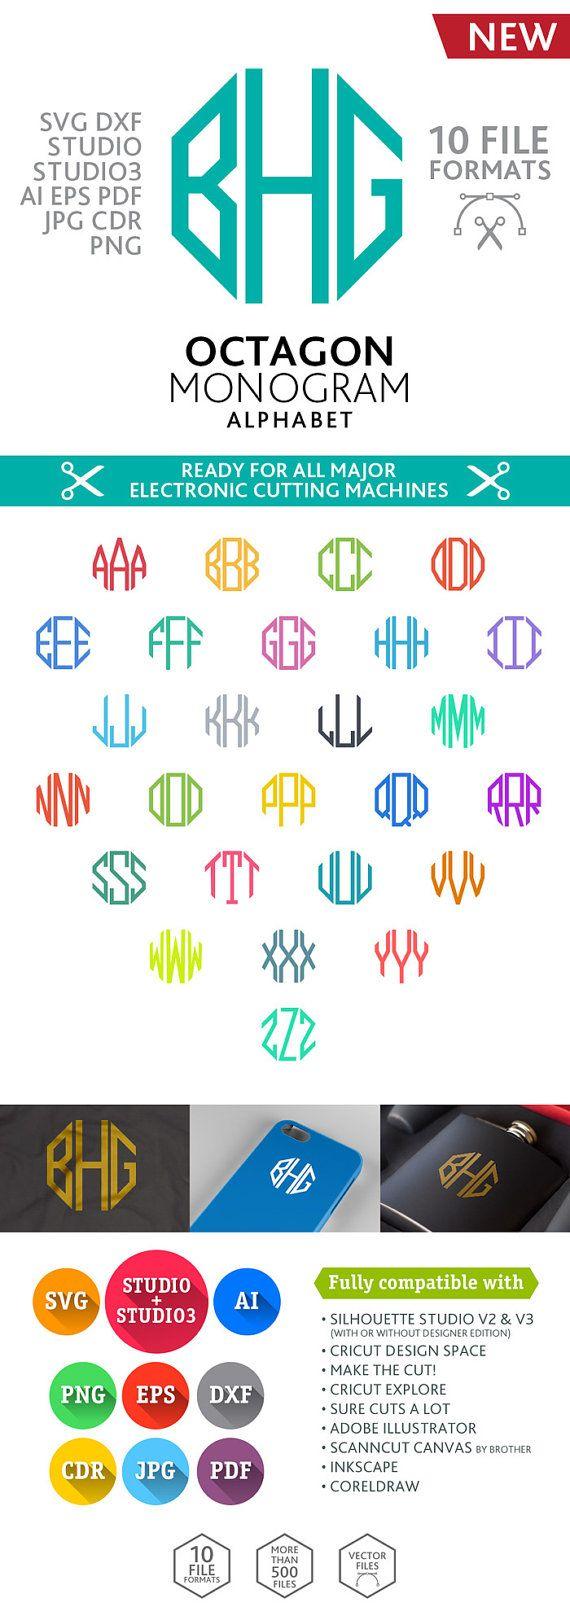 Octagon Monogram Font Alphabet (SVG DXF EPS Studio Studio3 Png Pdf Jpg Ai Cdr) digital cut files for Silhouette Studio, Cricut, Cameo